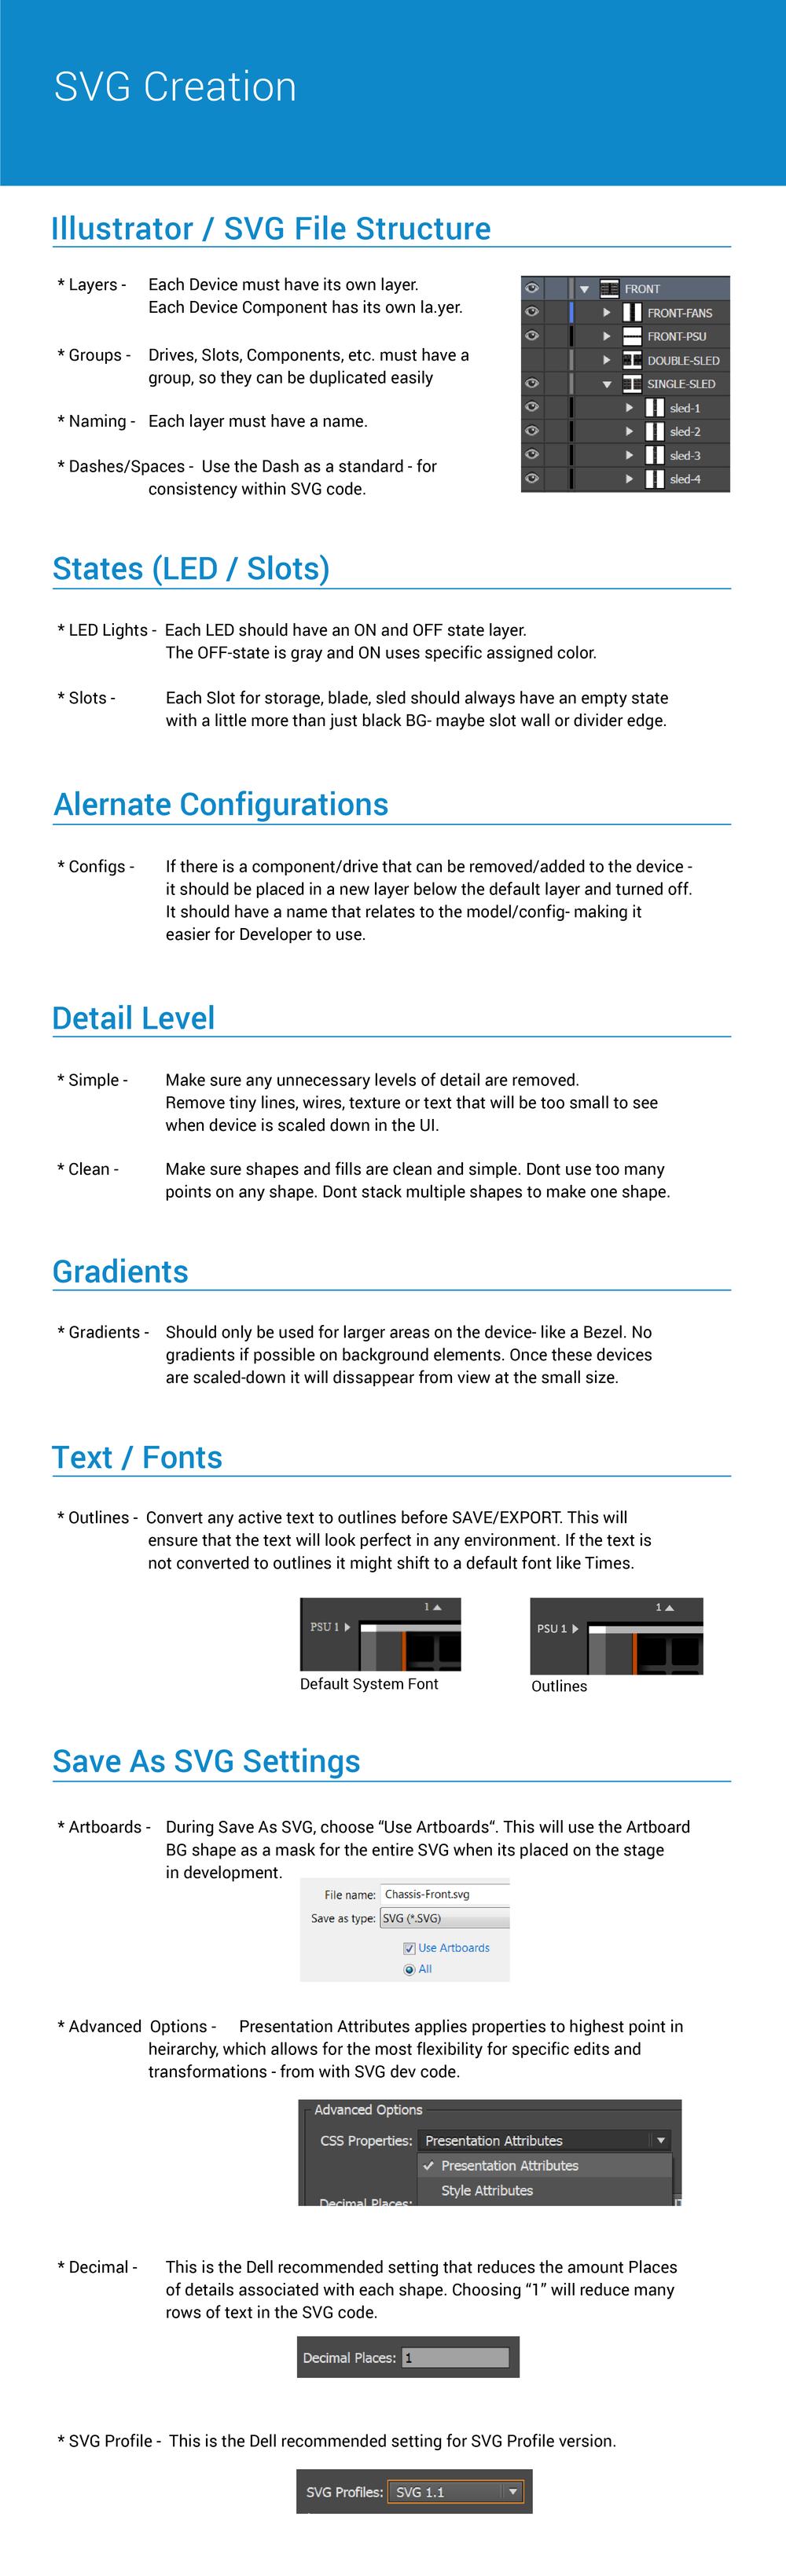 Style Guide: Methodology